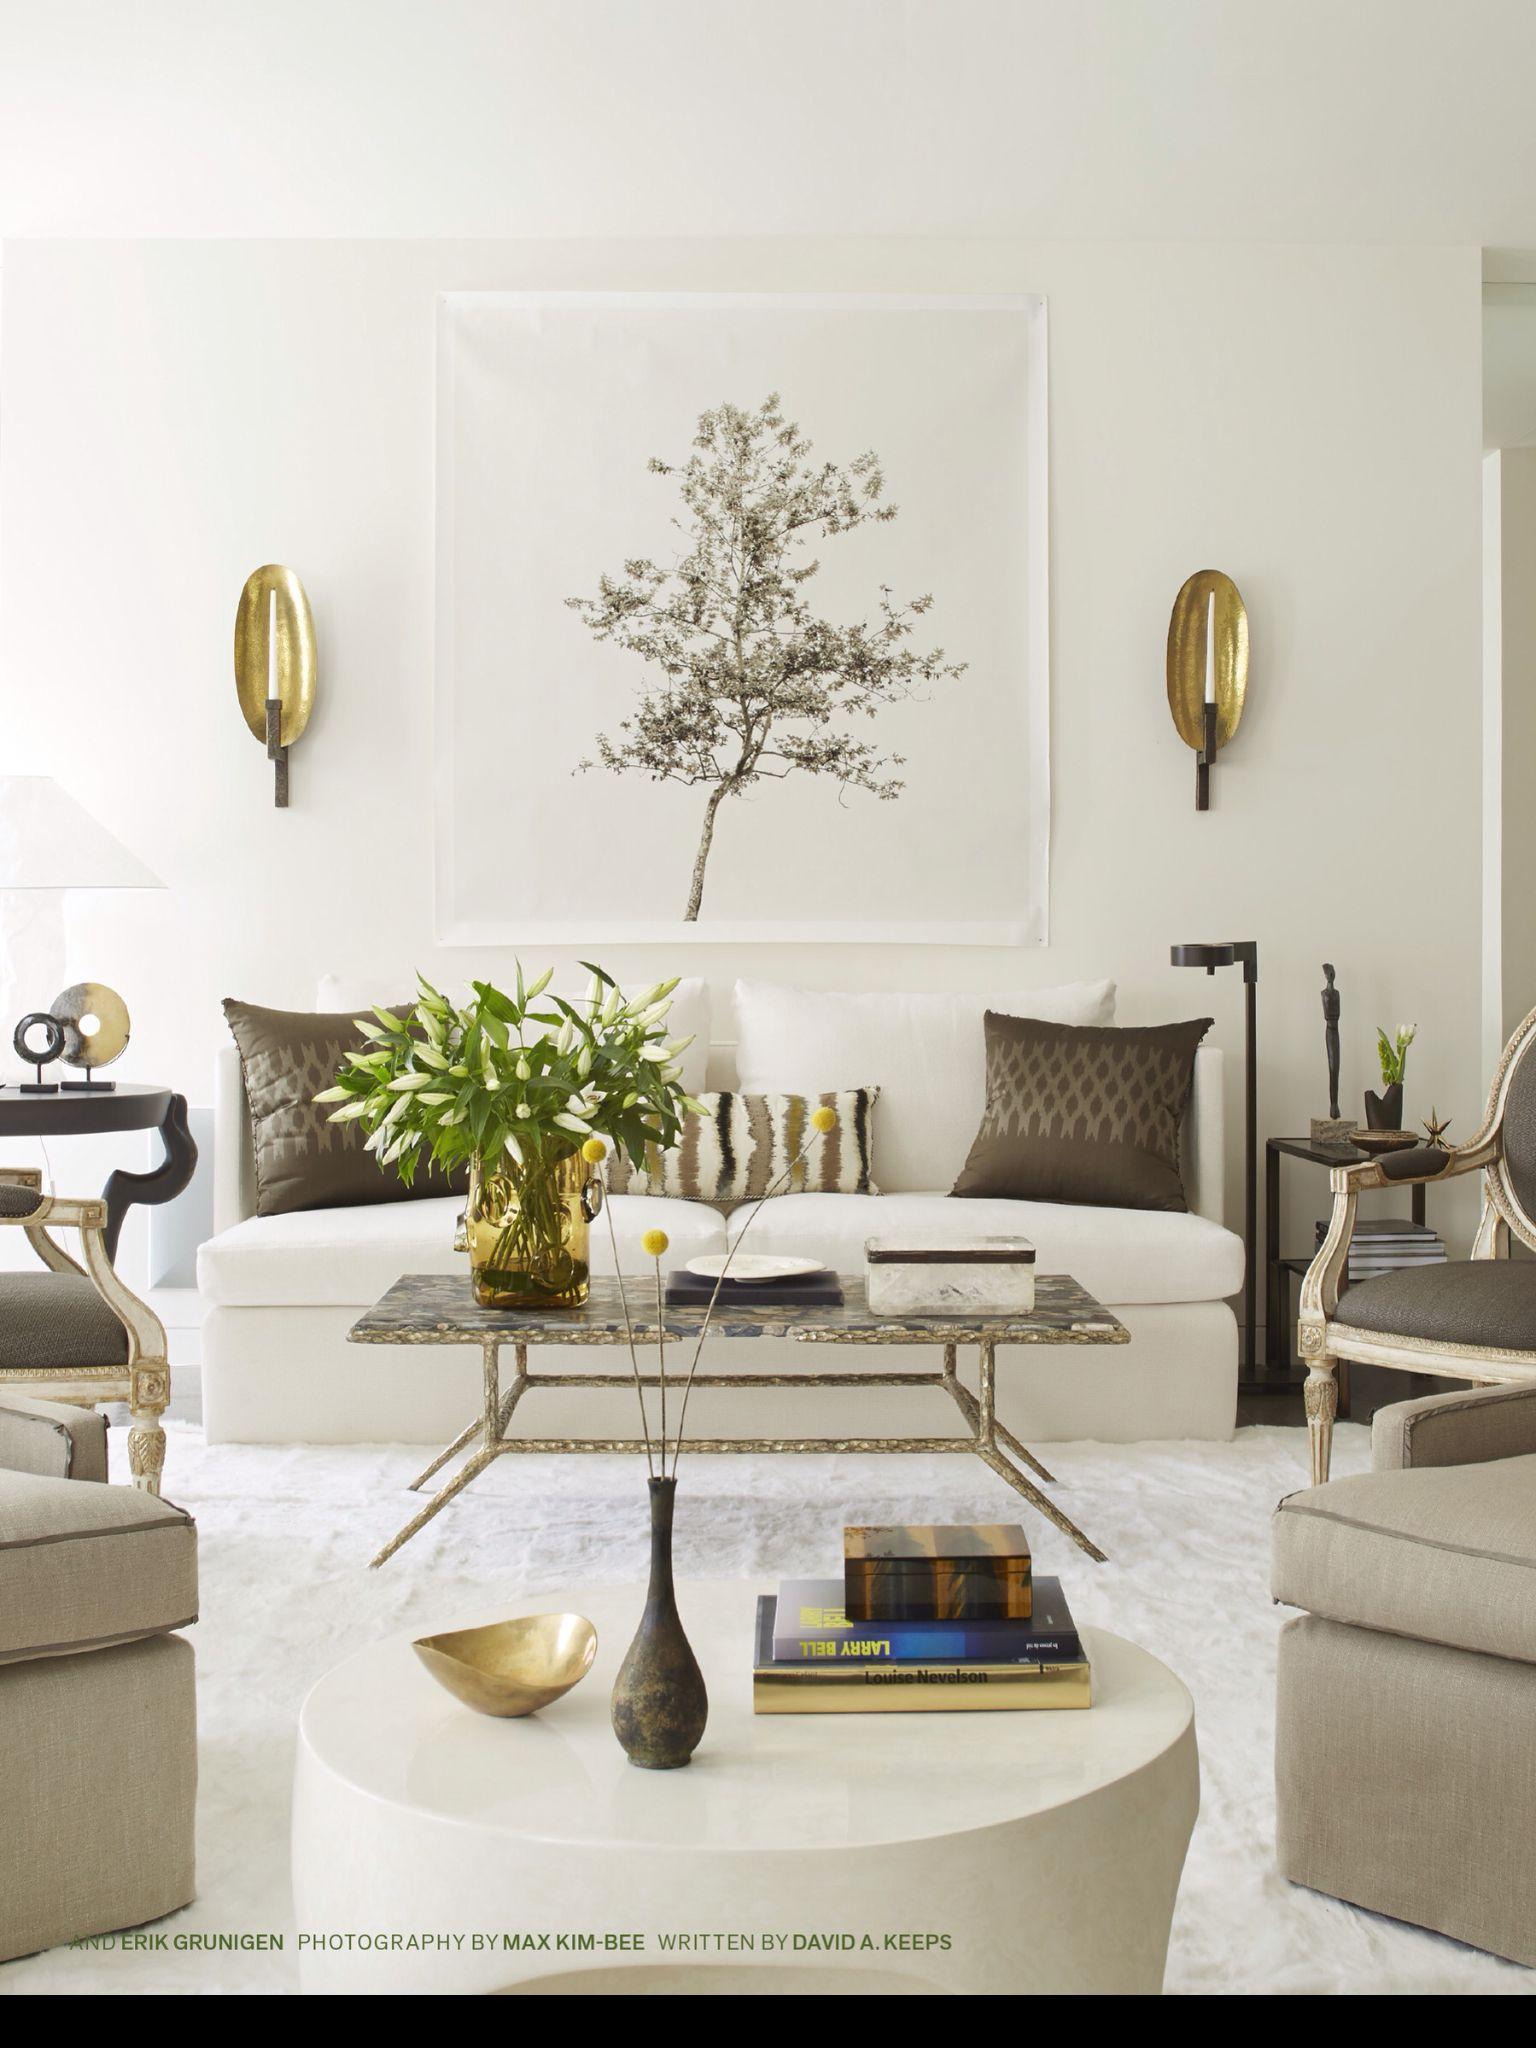 Pin By Patricia Fuentes On Home Living Room Designs Interior Design Room Living room ideas veranda